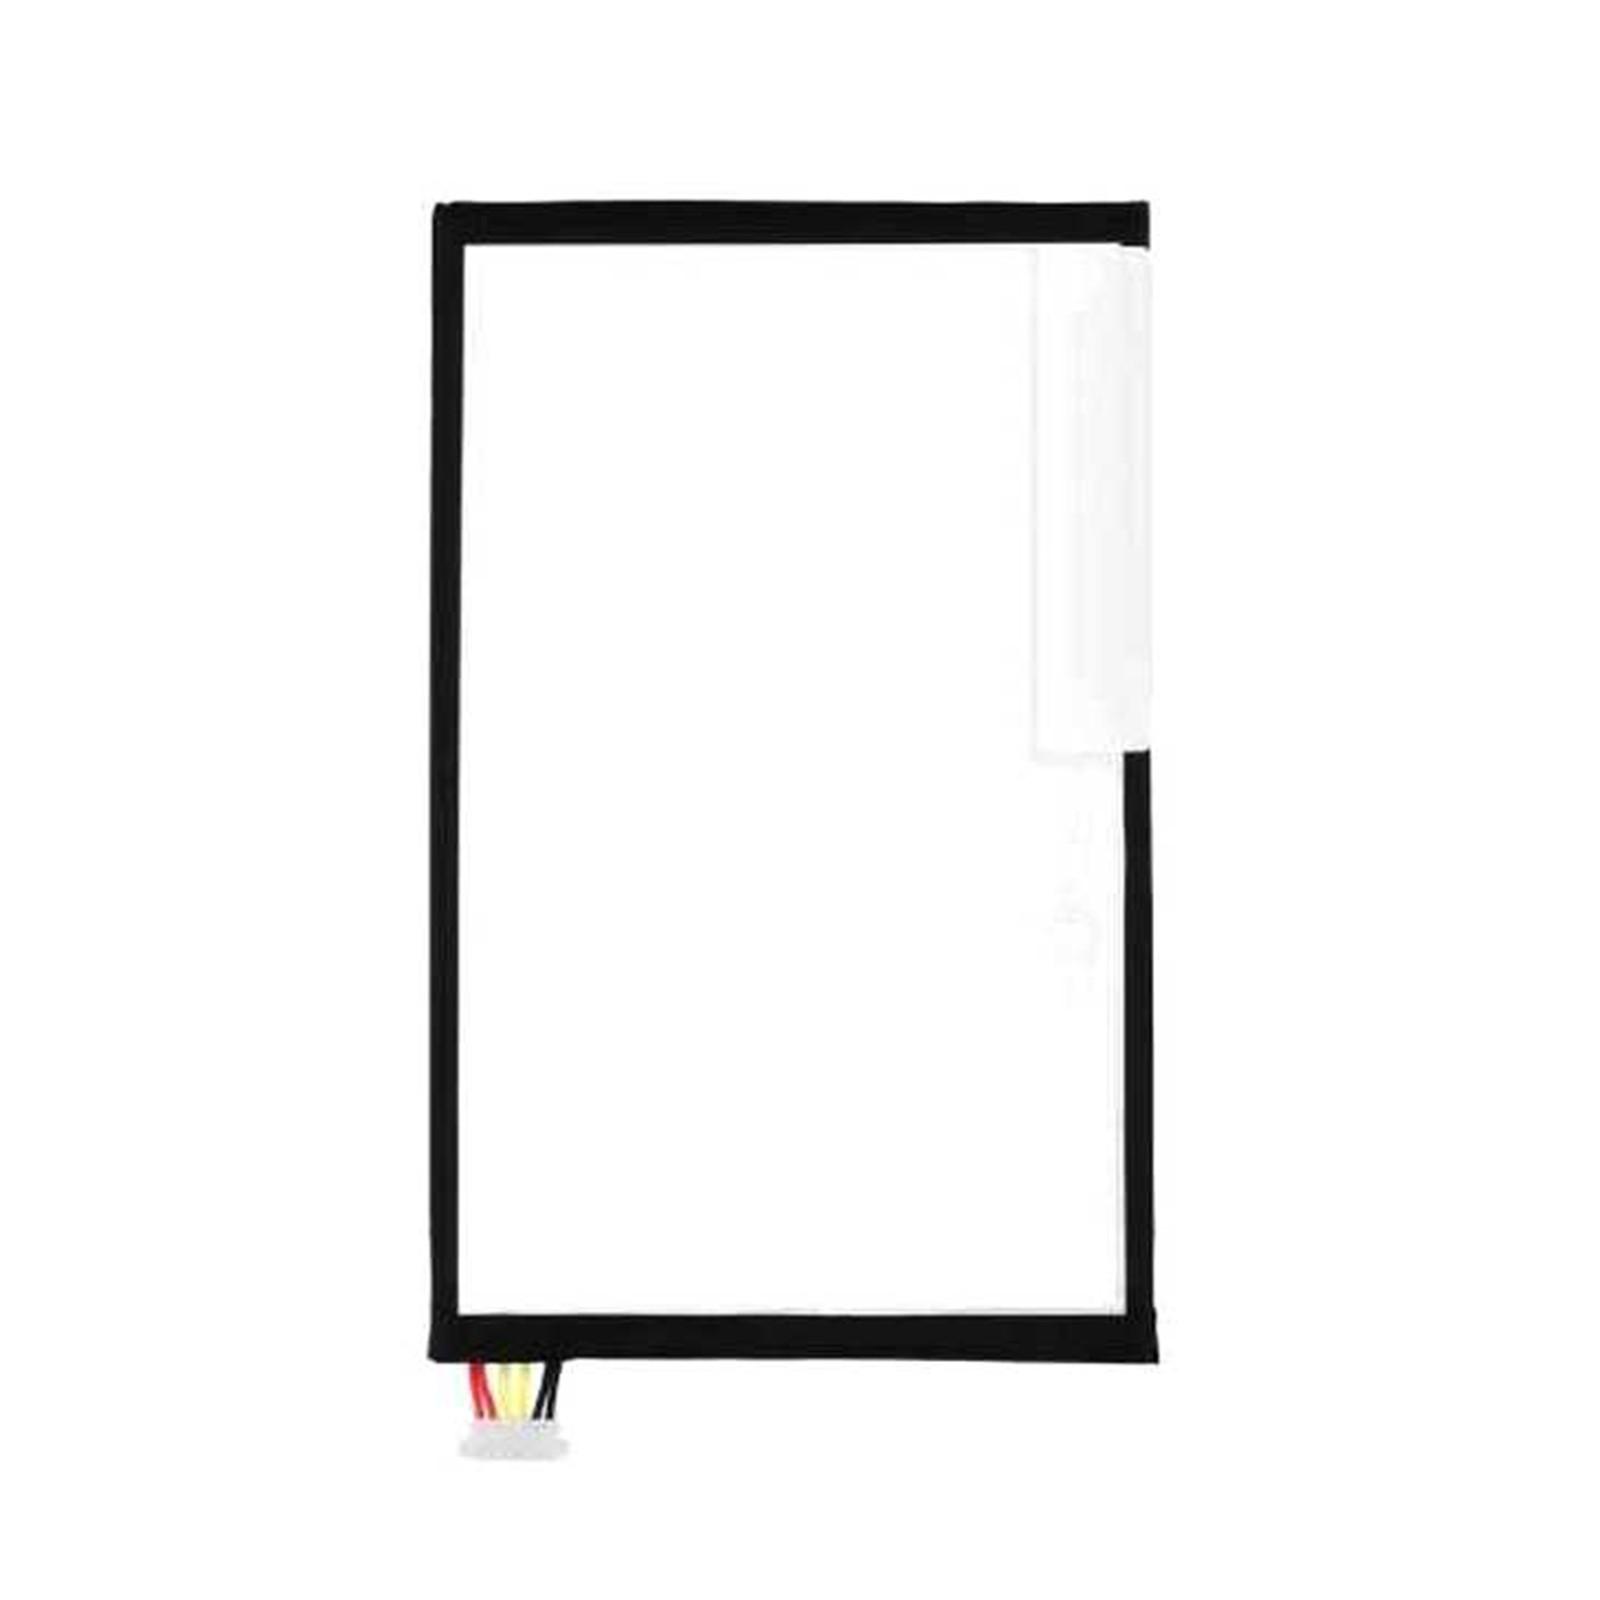 Batteria Originale Samsung T4450E 4450mAh Per Galaxy Tab 3